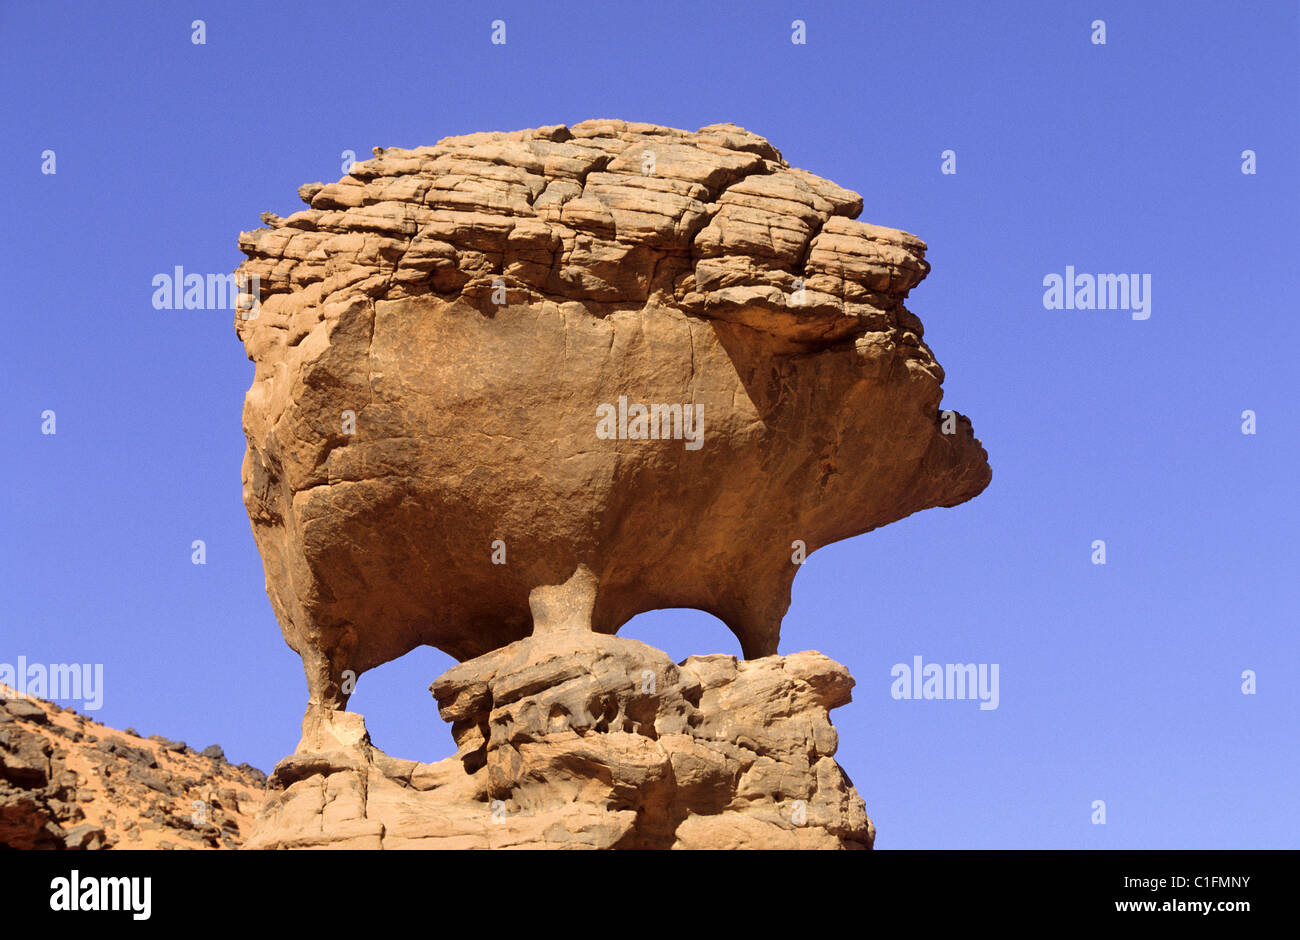 Algeria, Sahara, Tadrart region, the Hedgehog Rock carved by nature Stock Photo